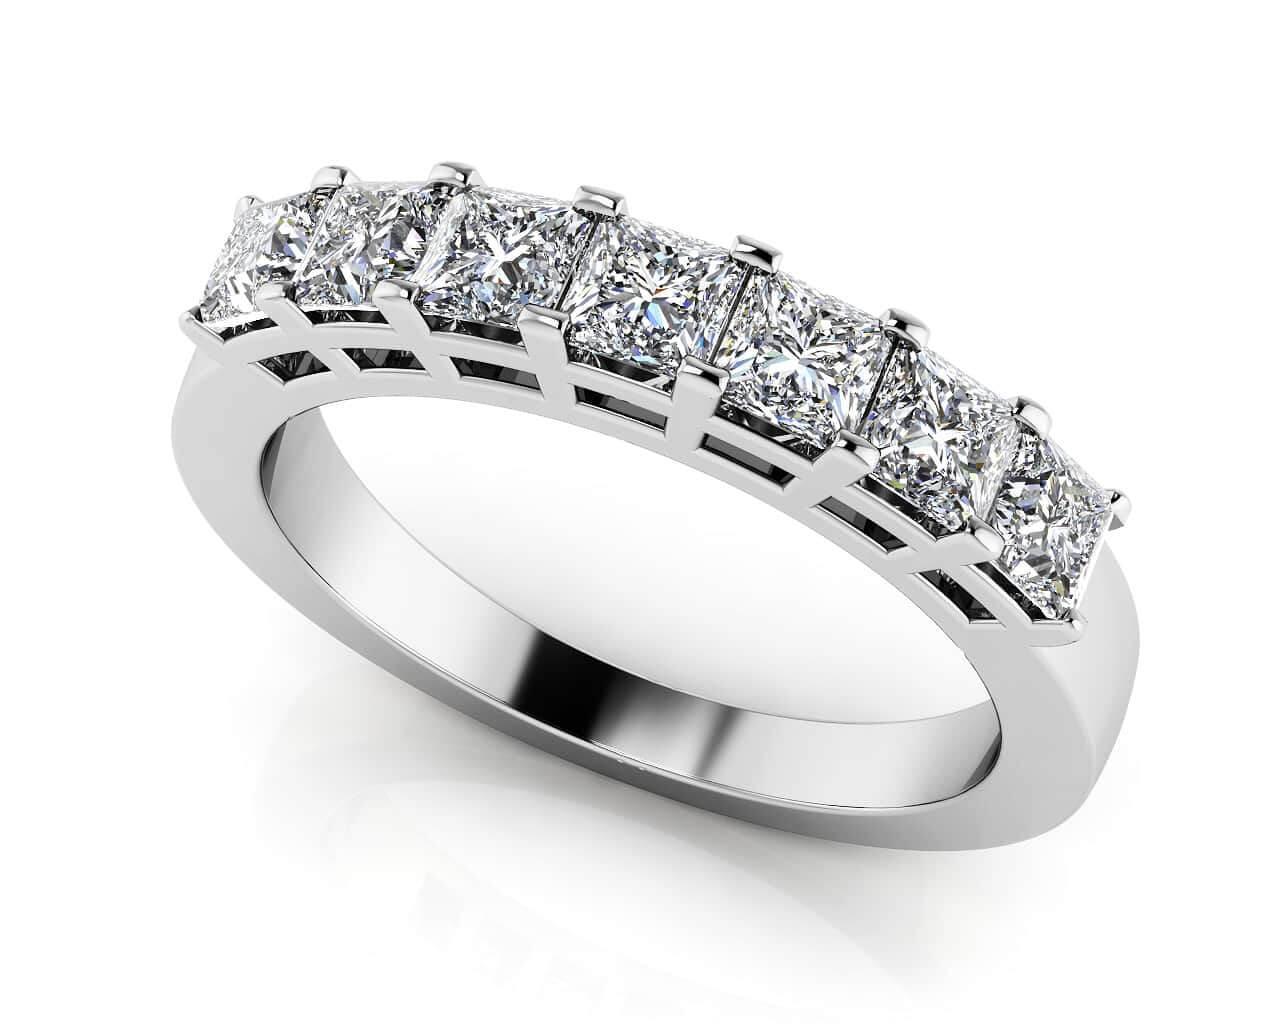 design your own diamond anniversary ring eternity ring - Wedding Anniversary Rings